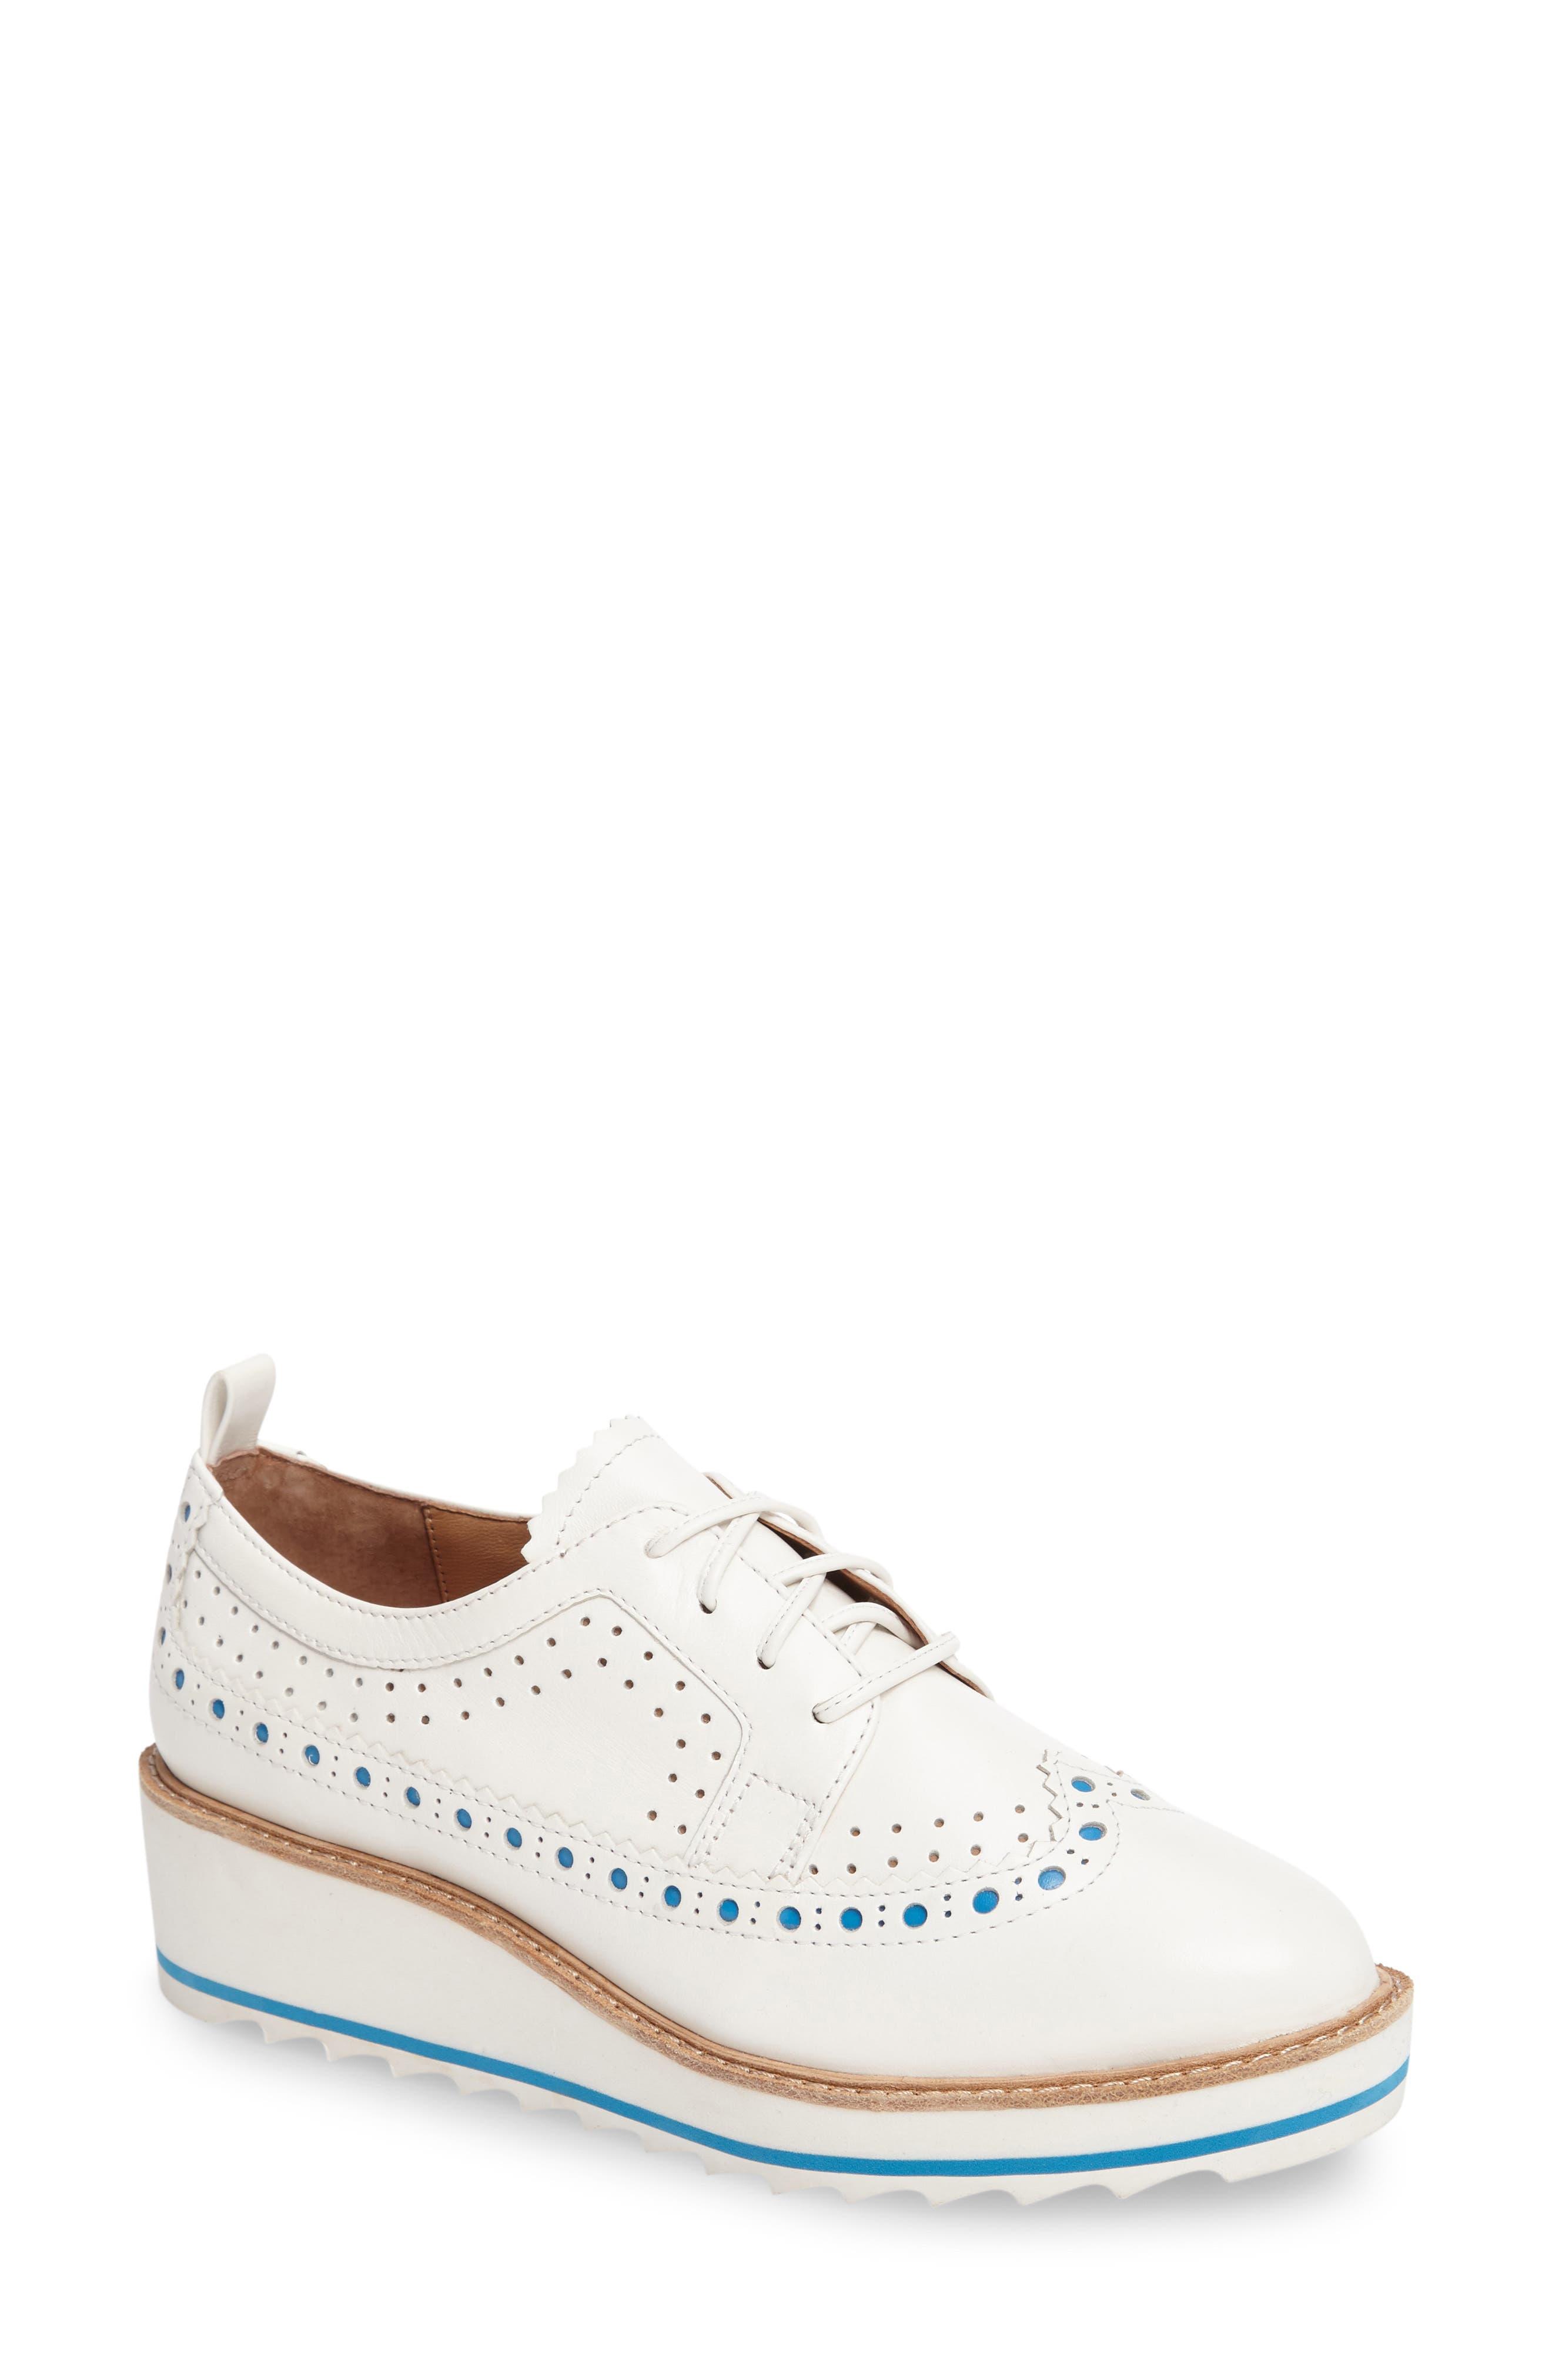 Malti Platform Wedge Oxford,                         Main,                         color, White Leather